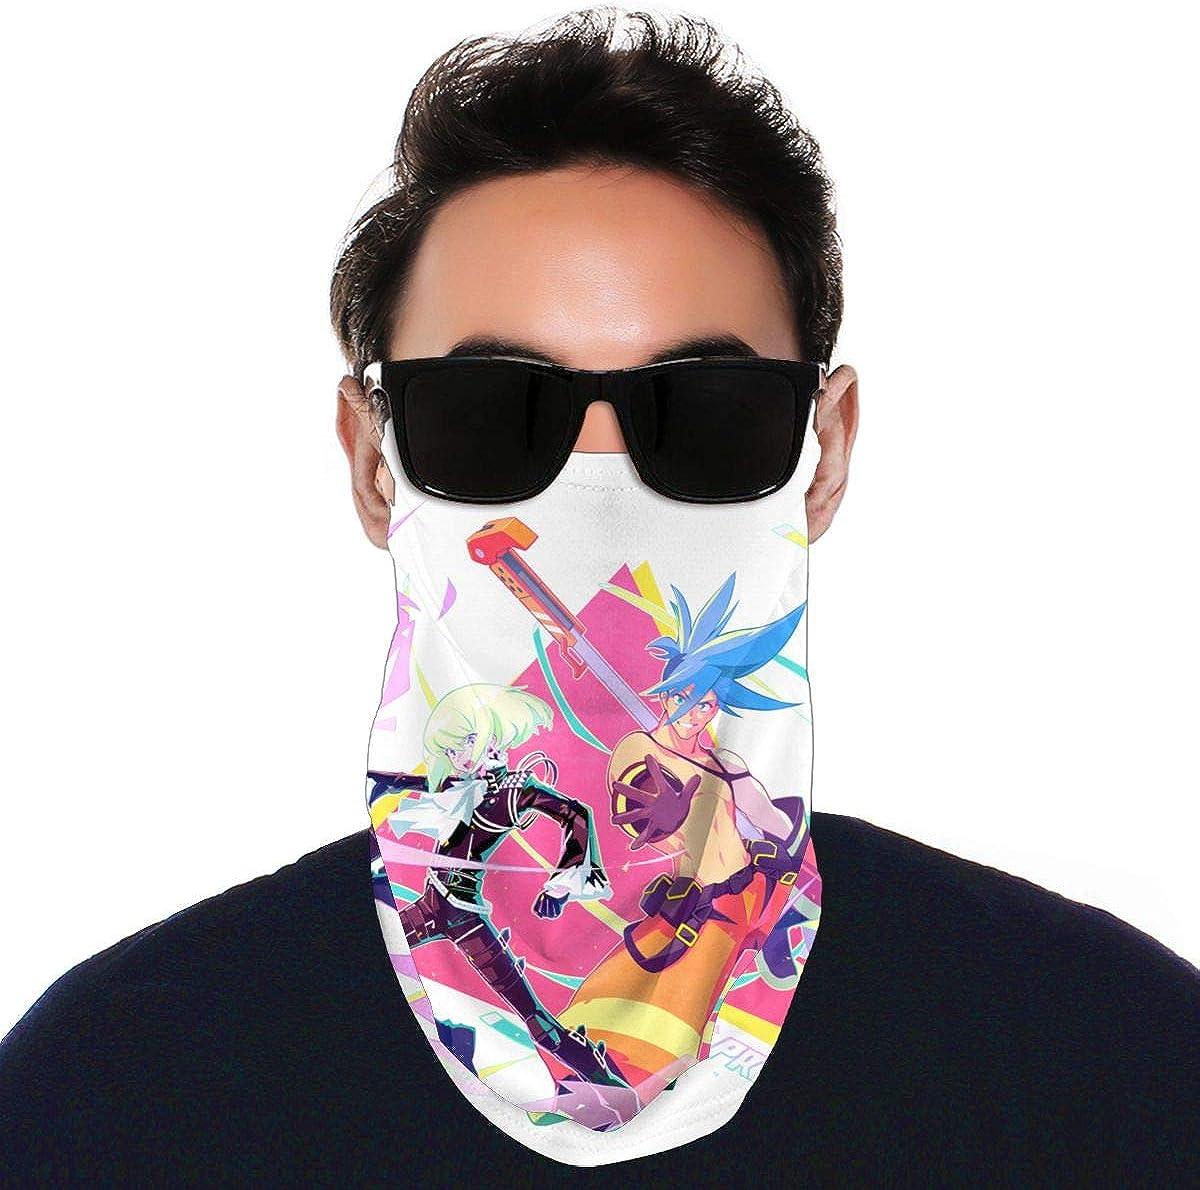 SIPONE Washable Men's & Women's Promare Reusable Multiuse Bandanas Neck Gaiter Print Mask